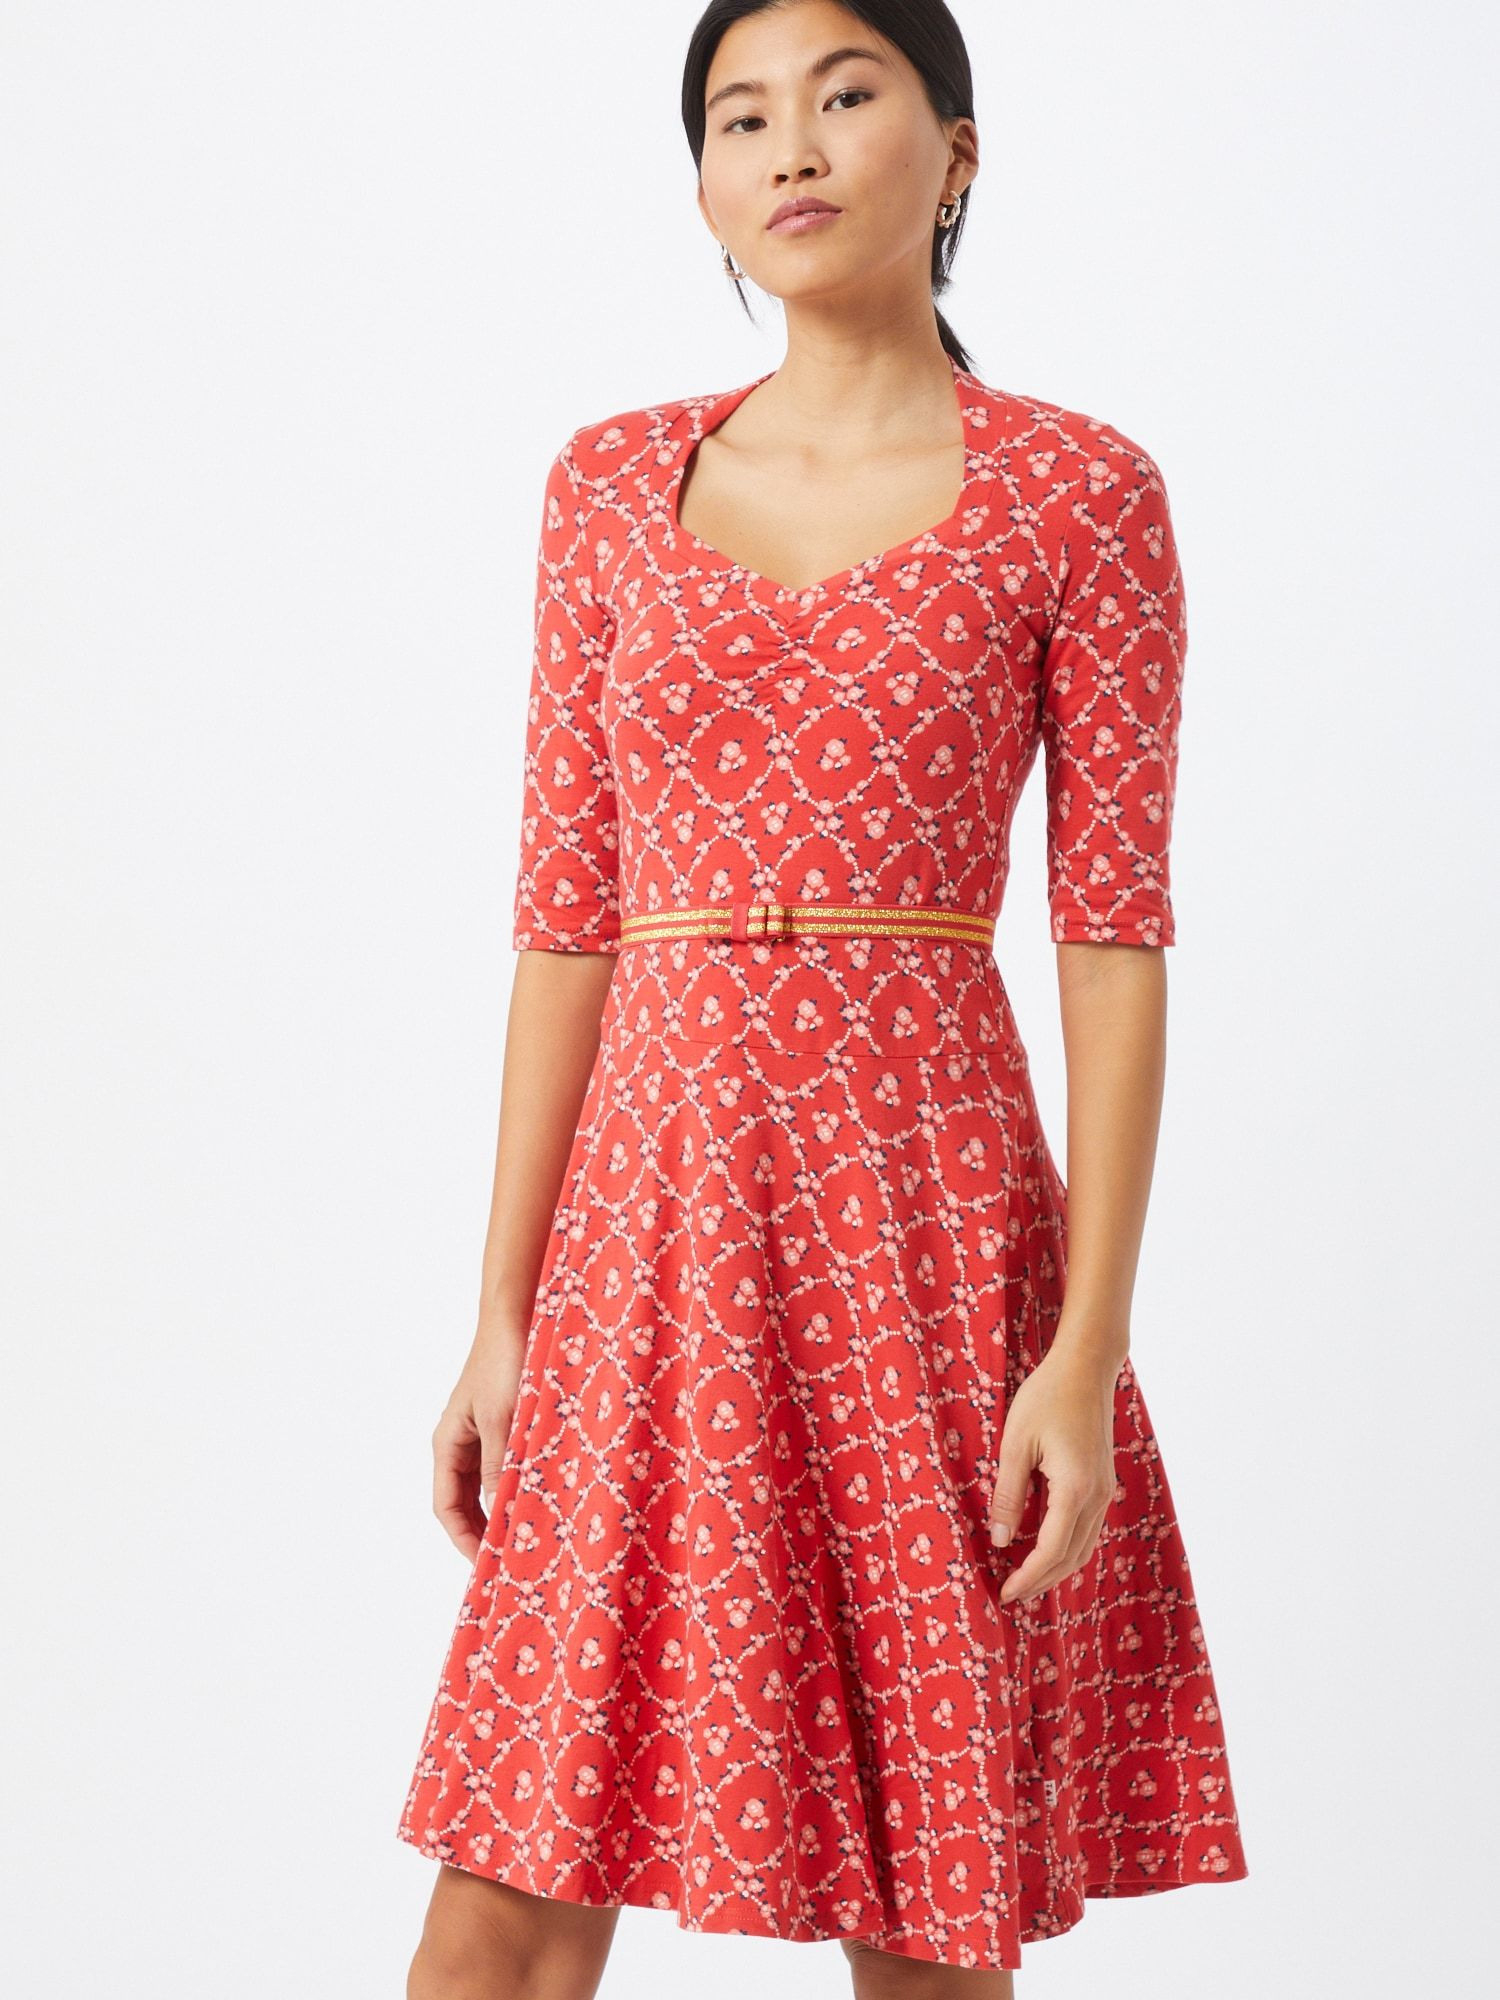 Blutsgeschwister Kleid Damen Rot Größe 34 In 2020